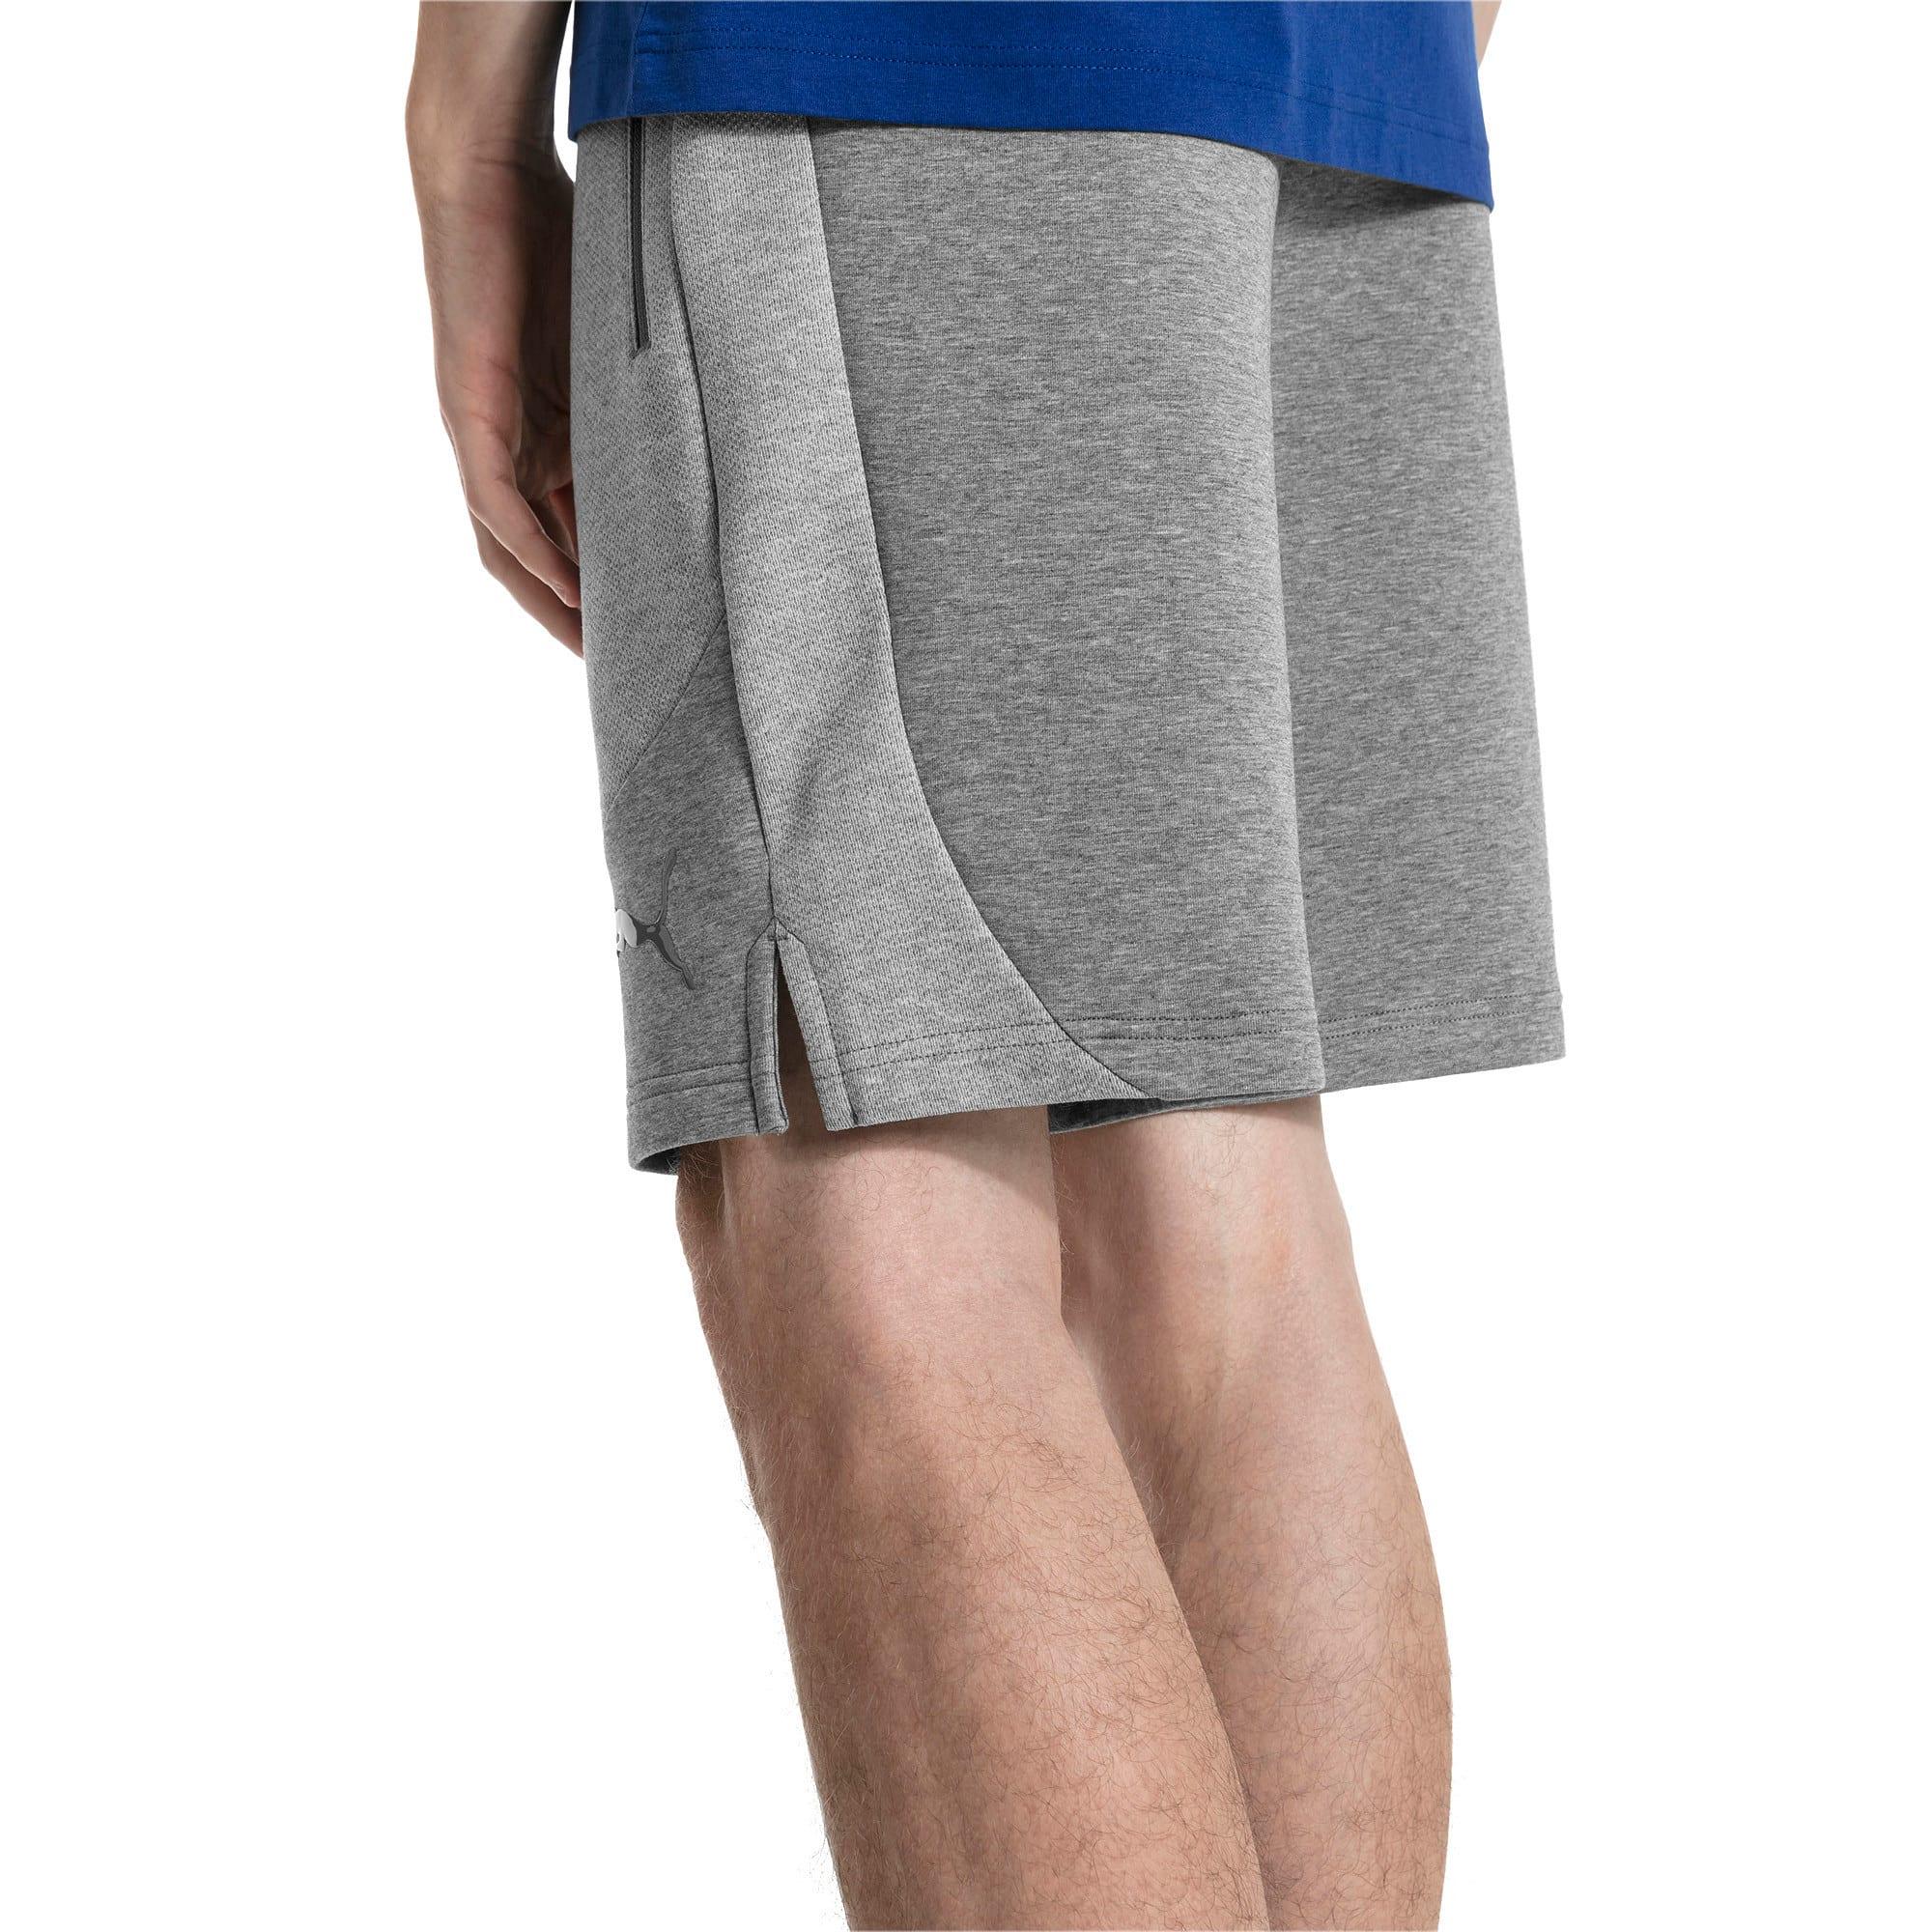 "Thumbnail 2 of Evostripe Move 8"" Men's Shorts, Medium Gray Heather, medium"